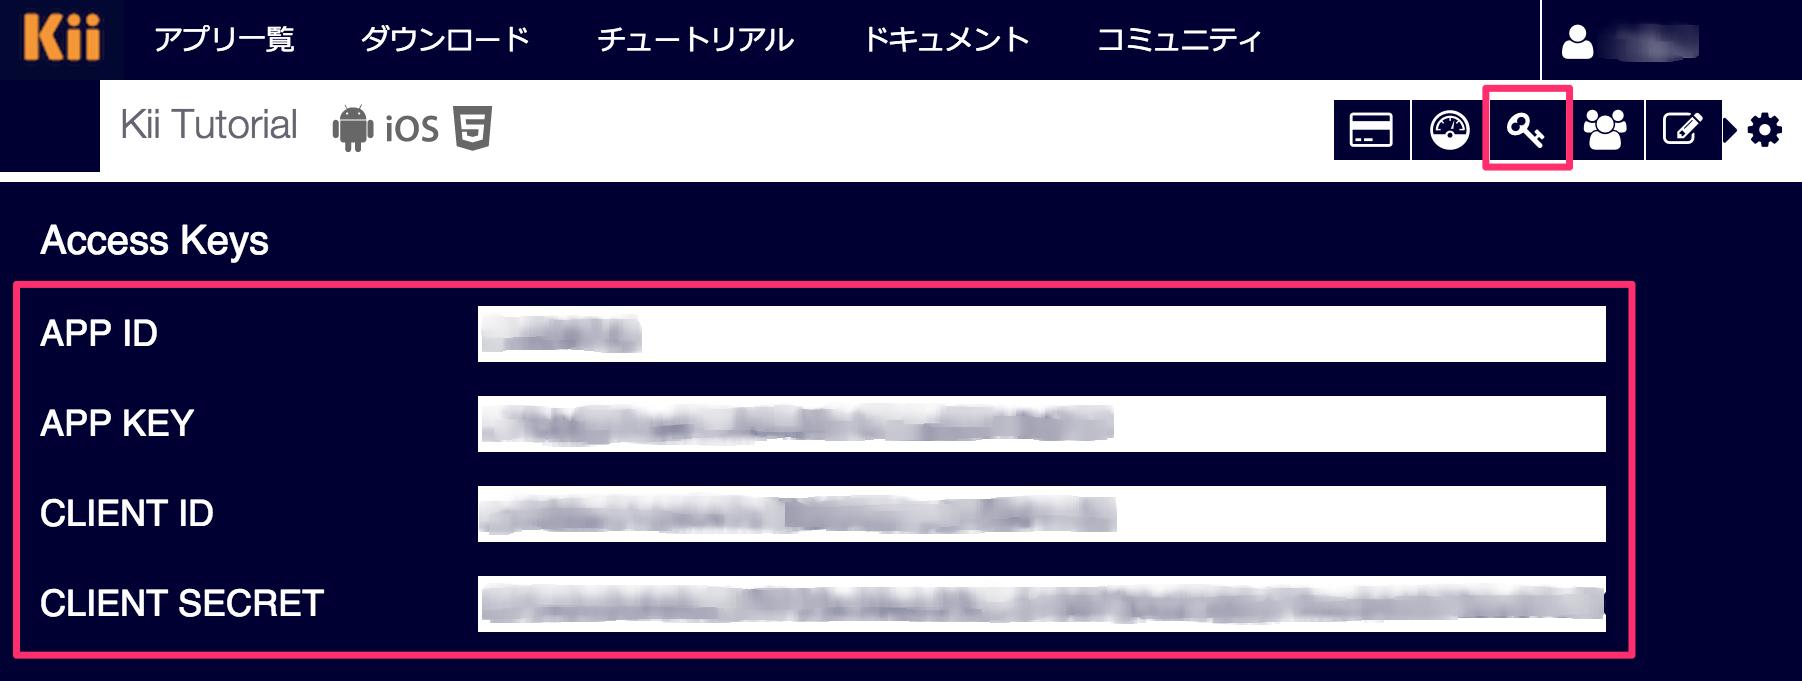 Kii Access Keys画面